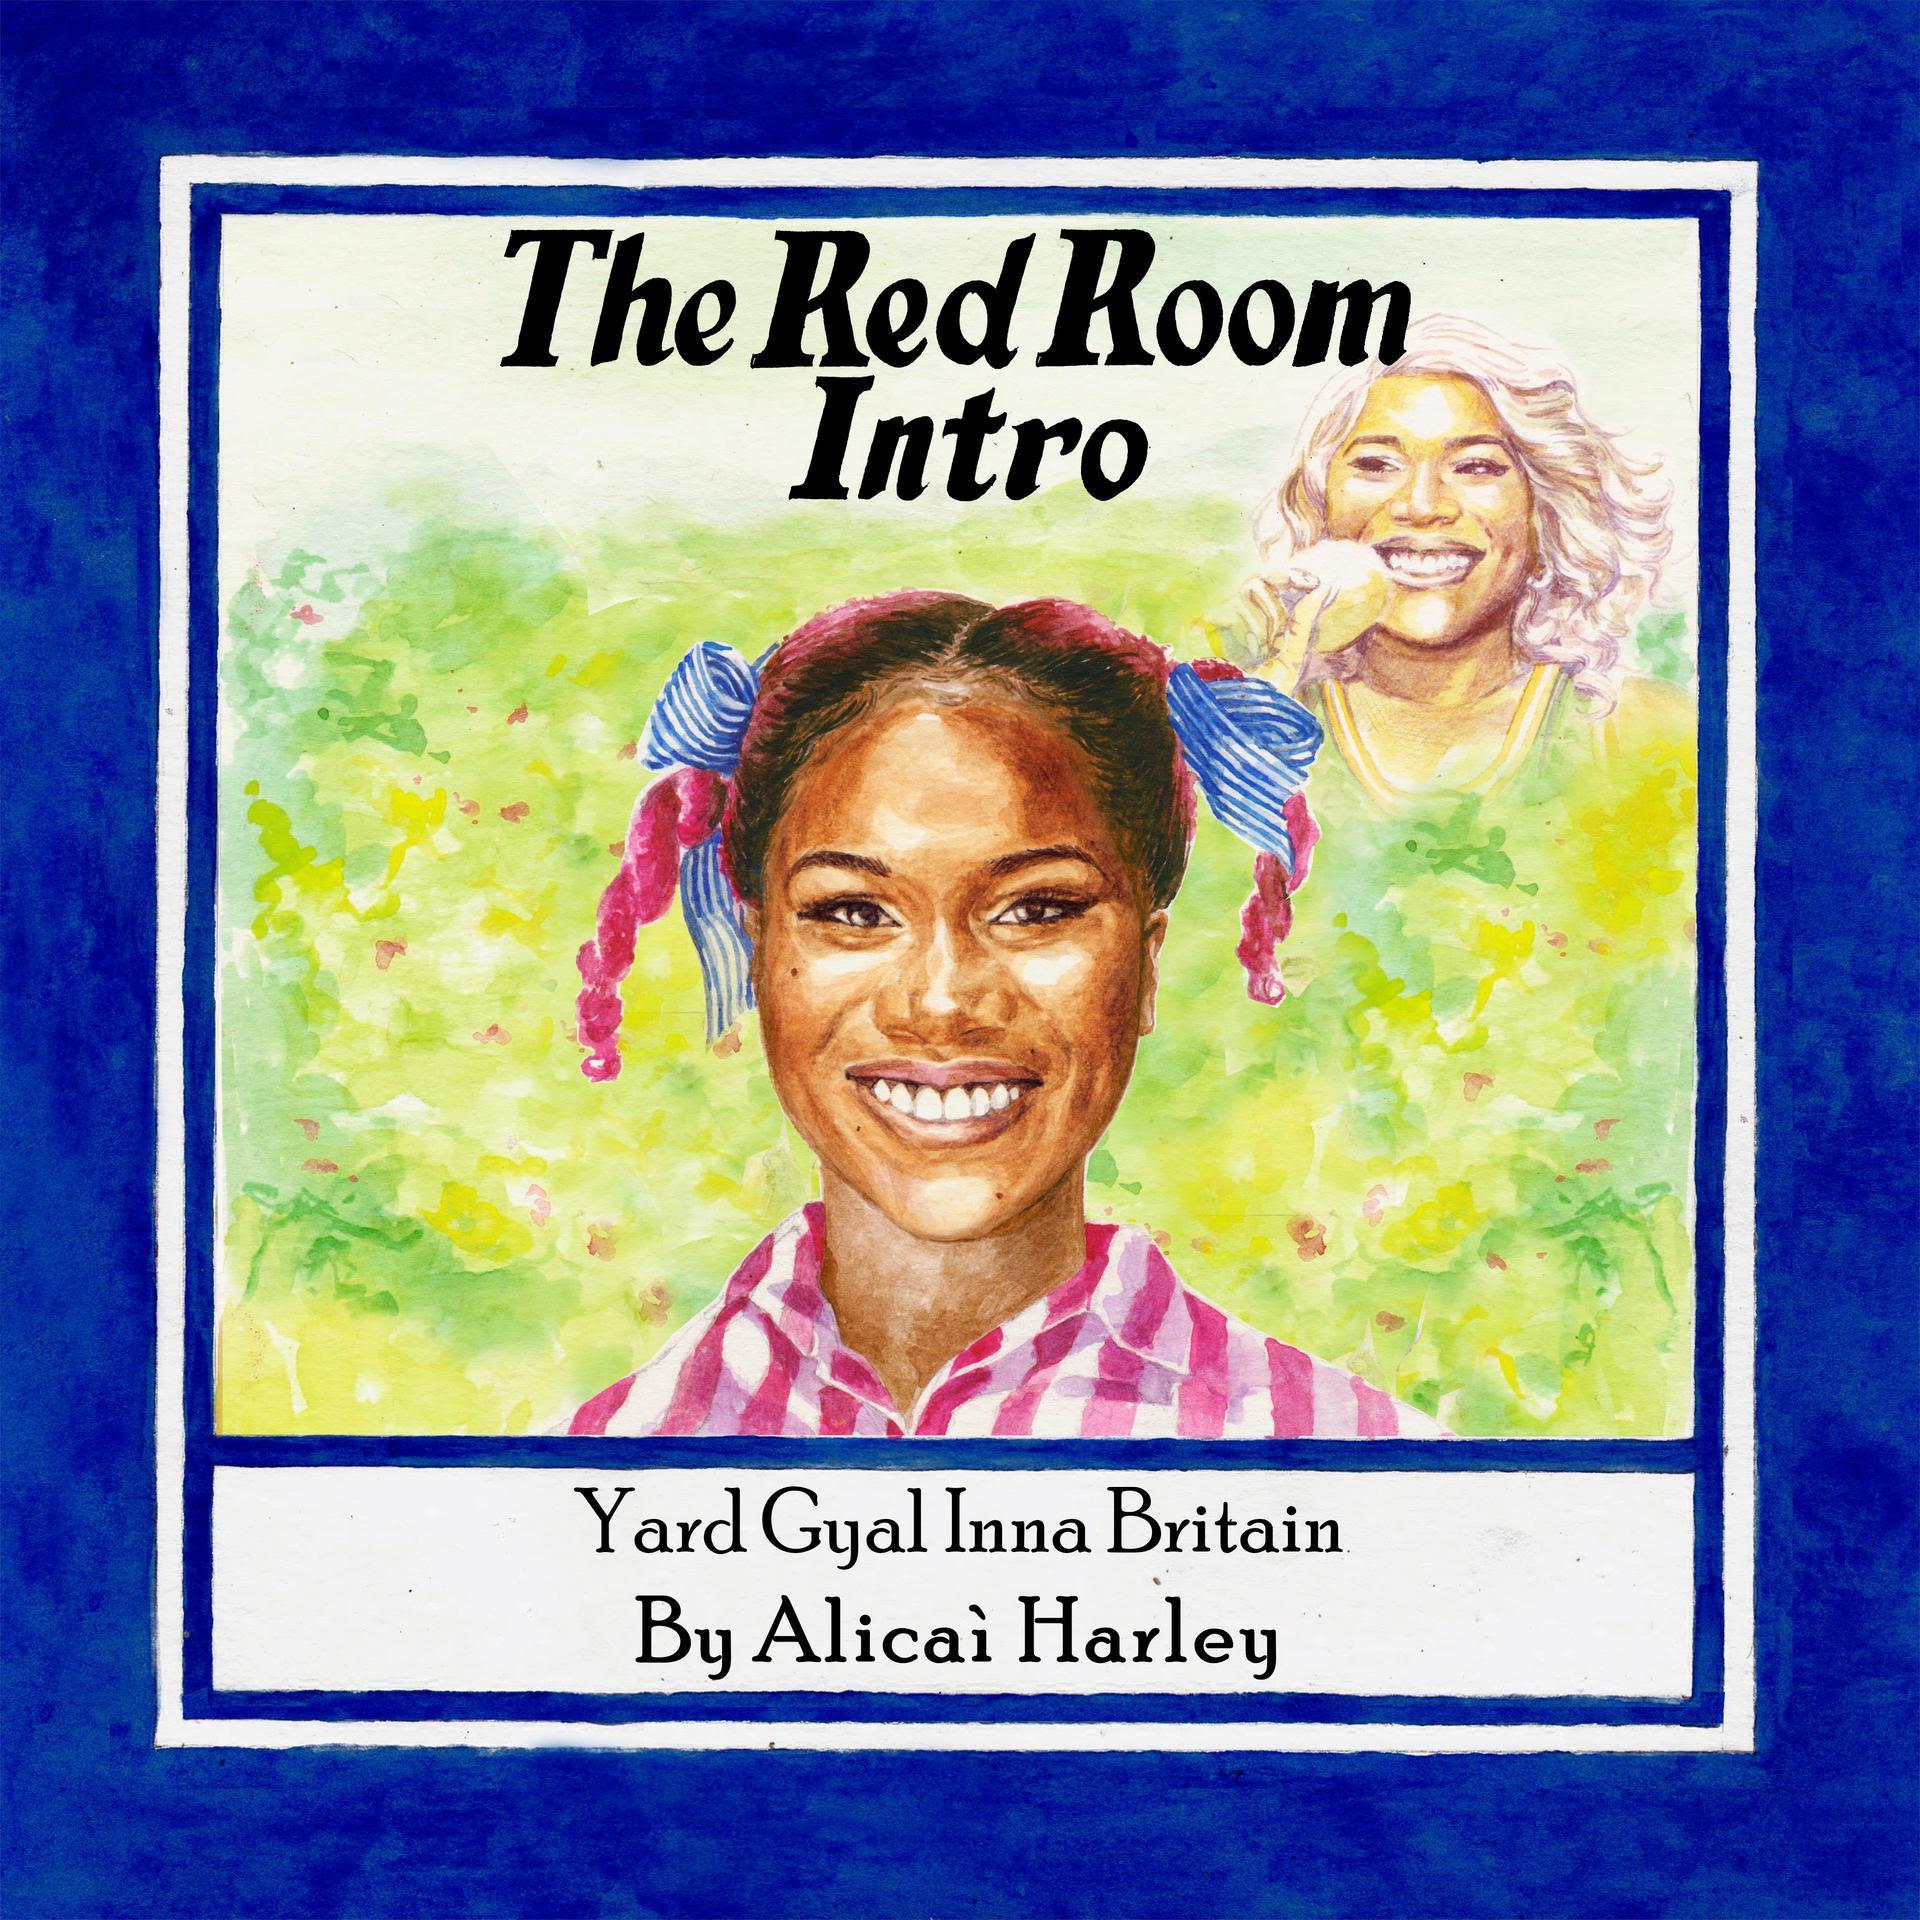 Alicai Harley – The Red Room Intro (Yard Gyal Inna Britain)